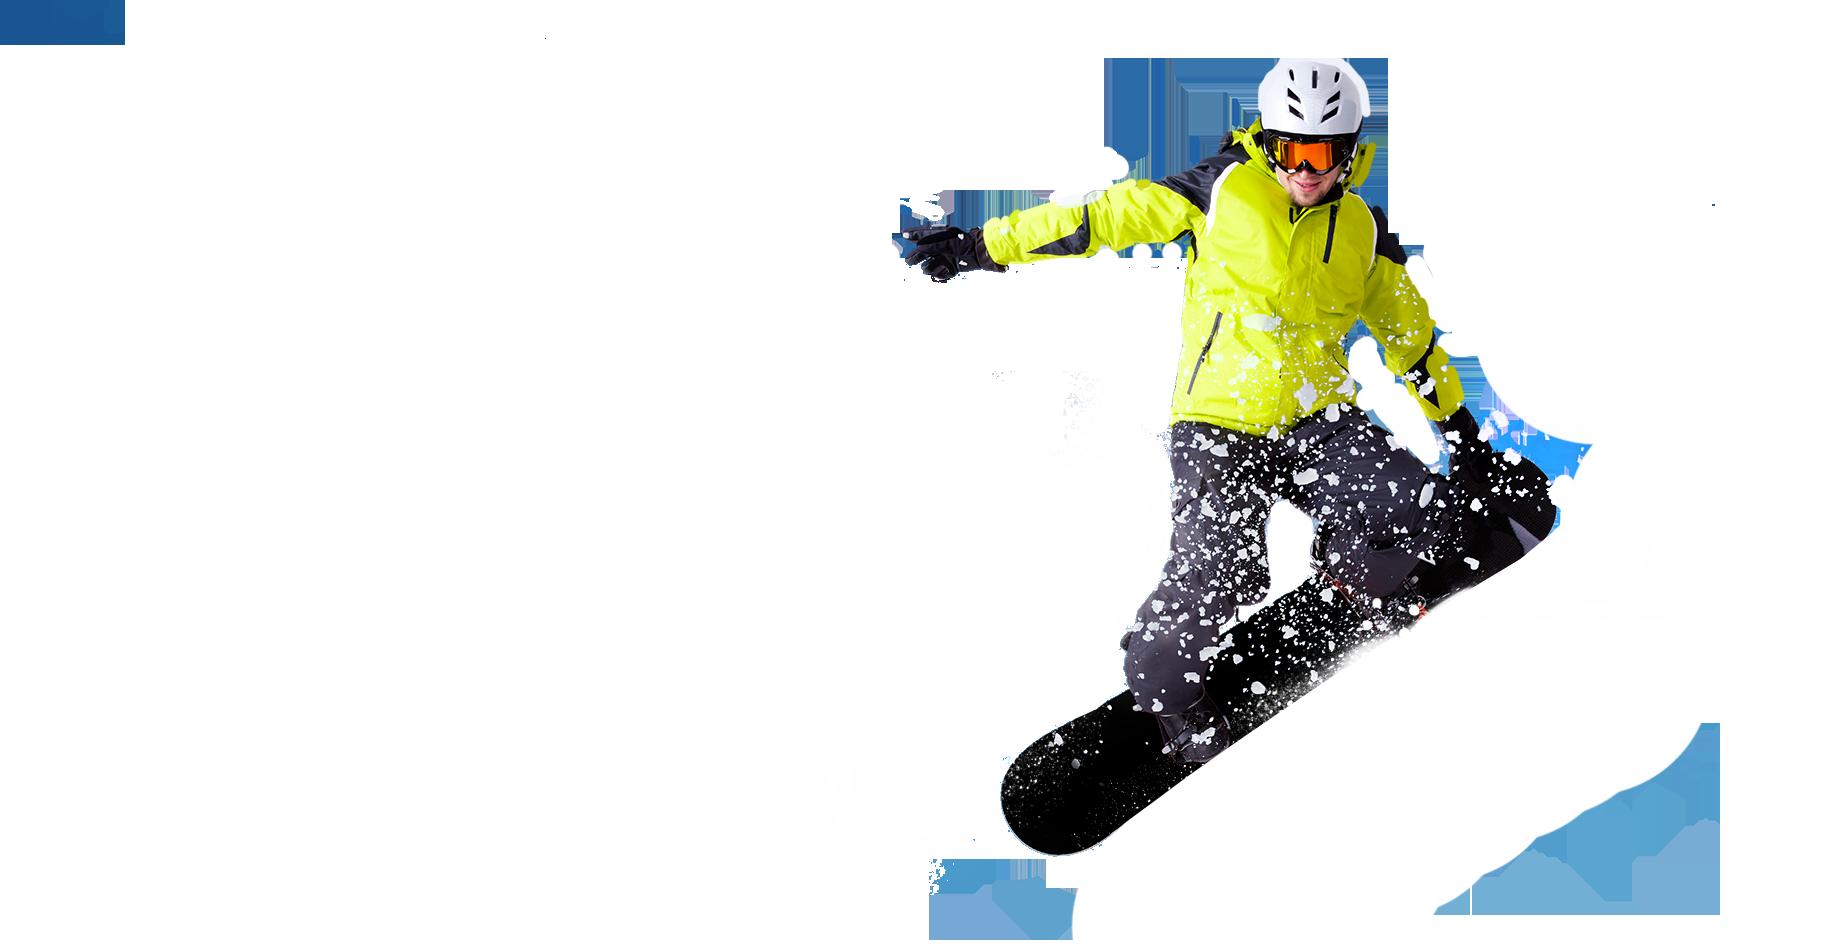 Snowboarding clipart female snowboarder, Snowboarding female.